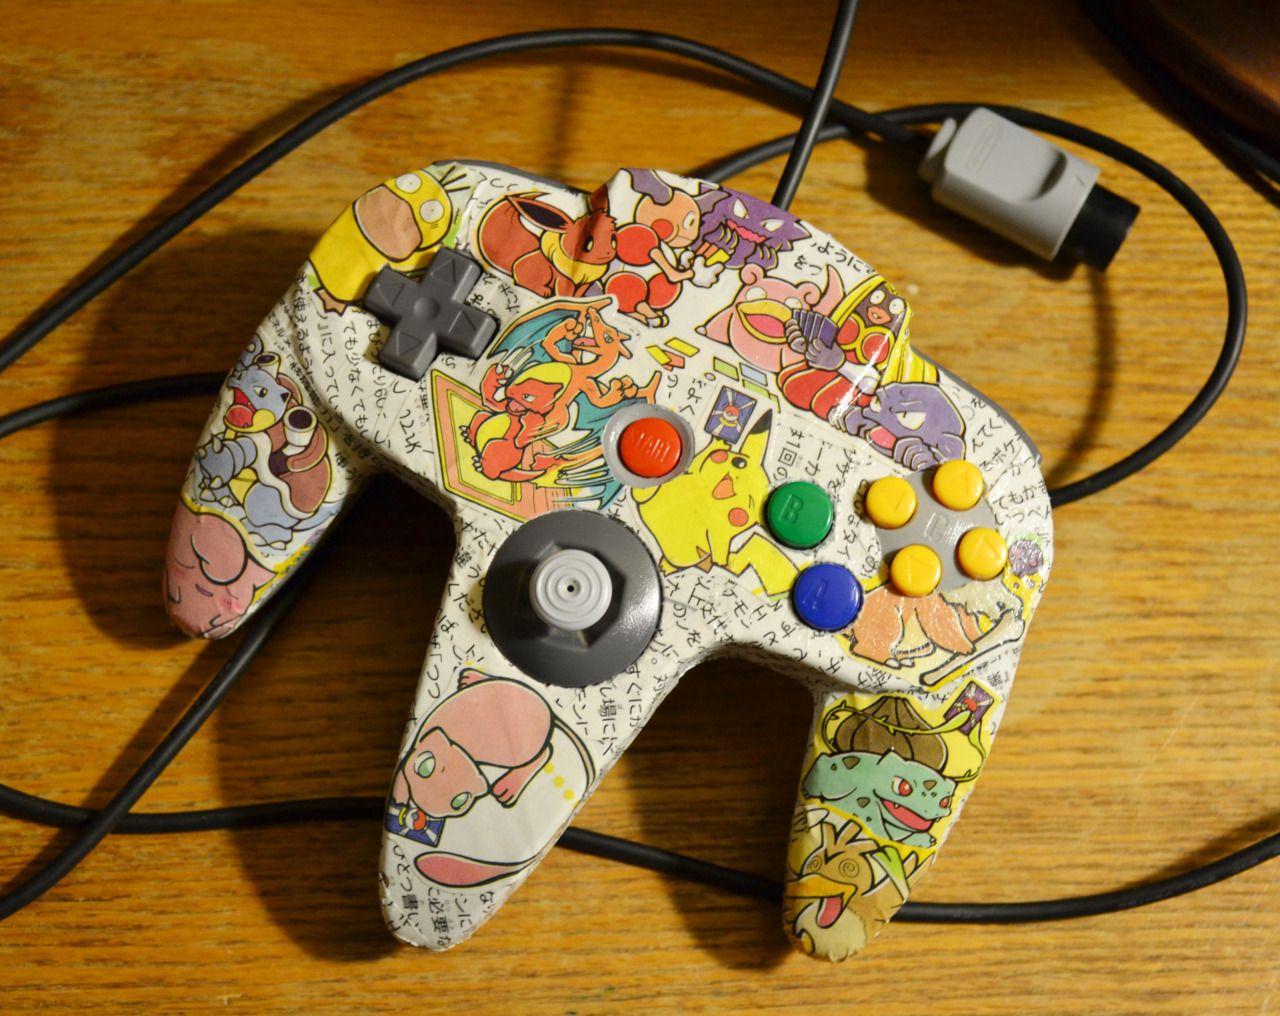 Pokemon N64 Controller